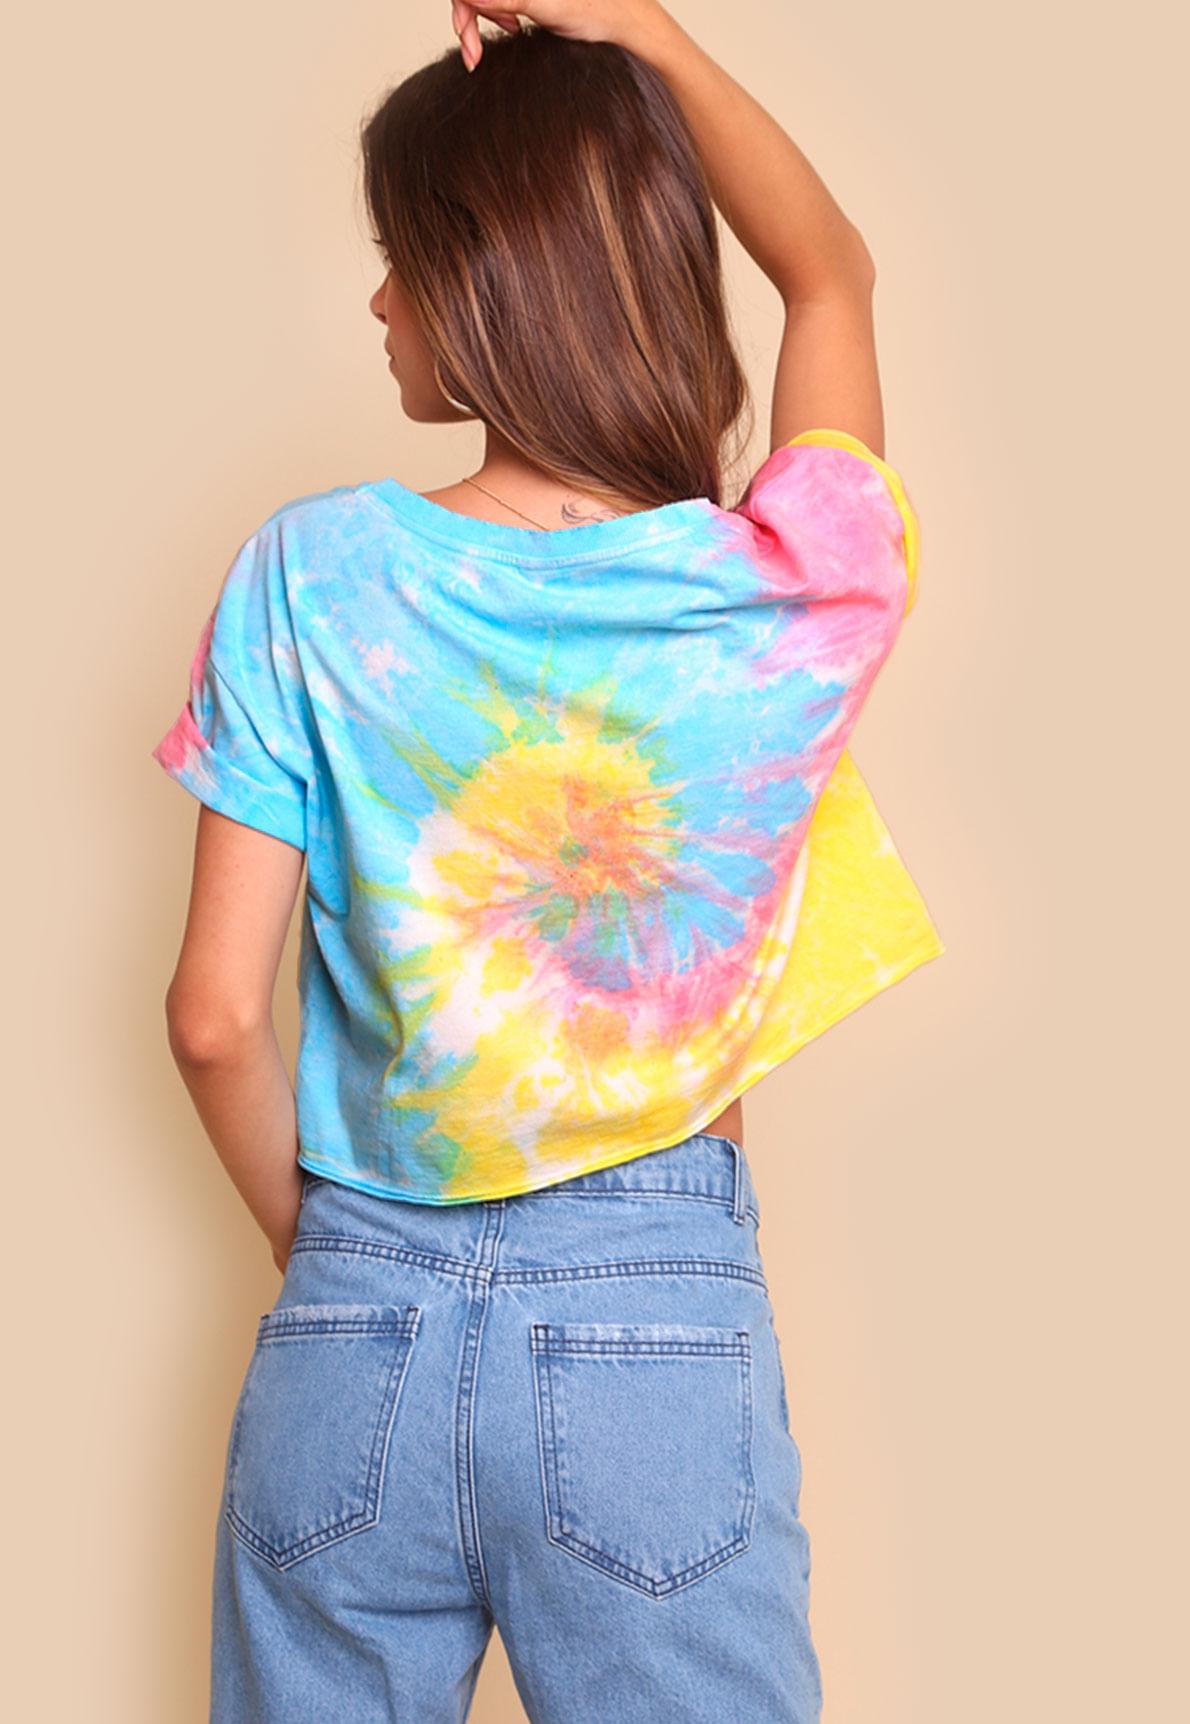 29763-T-Shirt-Mundo-Lolita-Feminina-Cropped-Tie-Dye-Lola-03